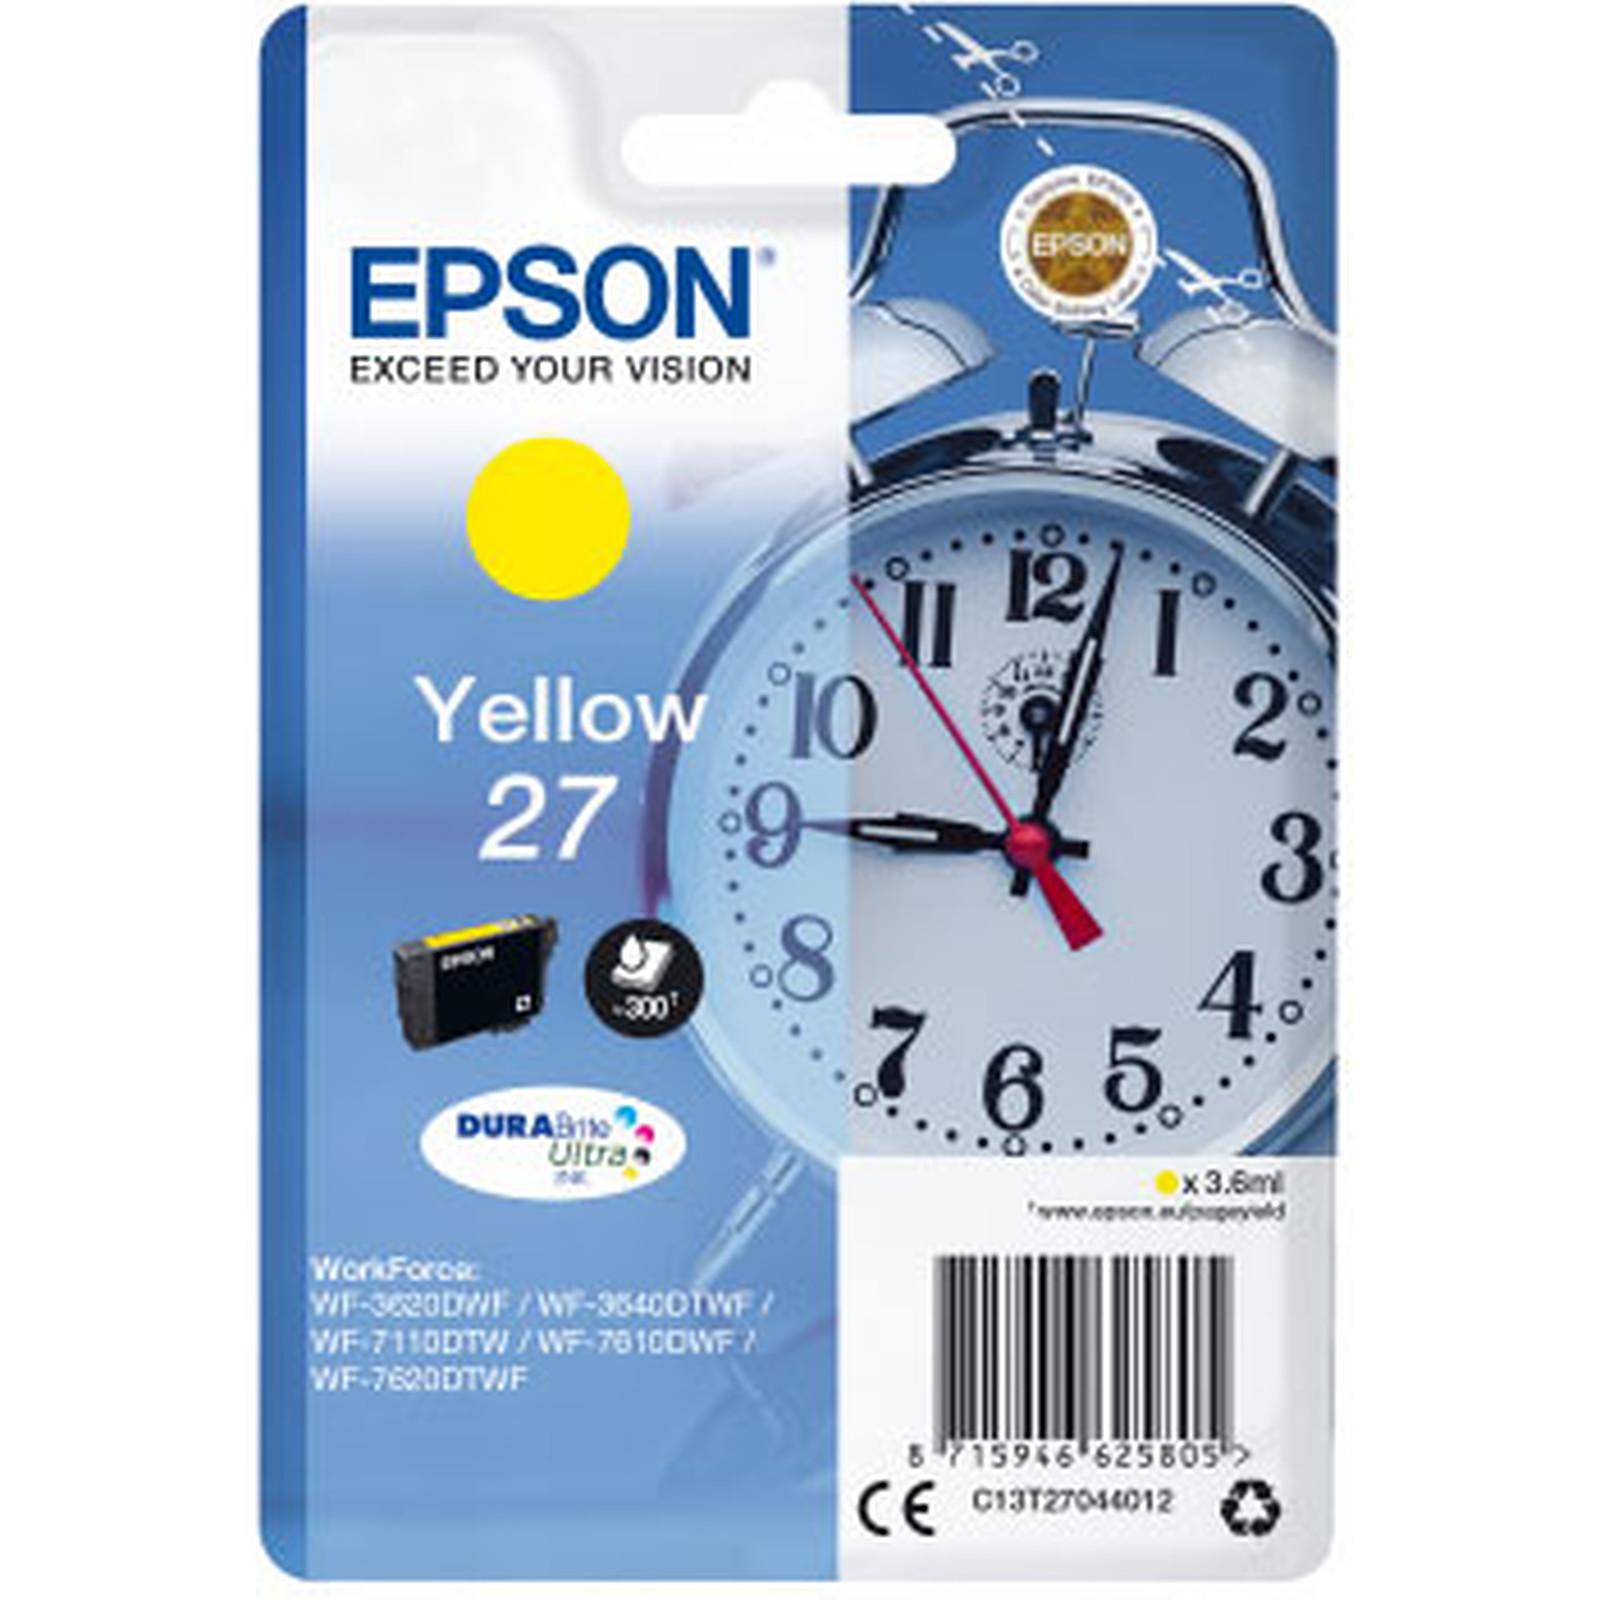 Epson Réveil 27 Jaune